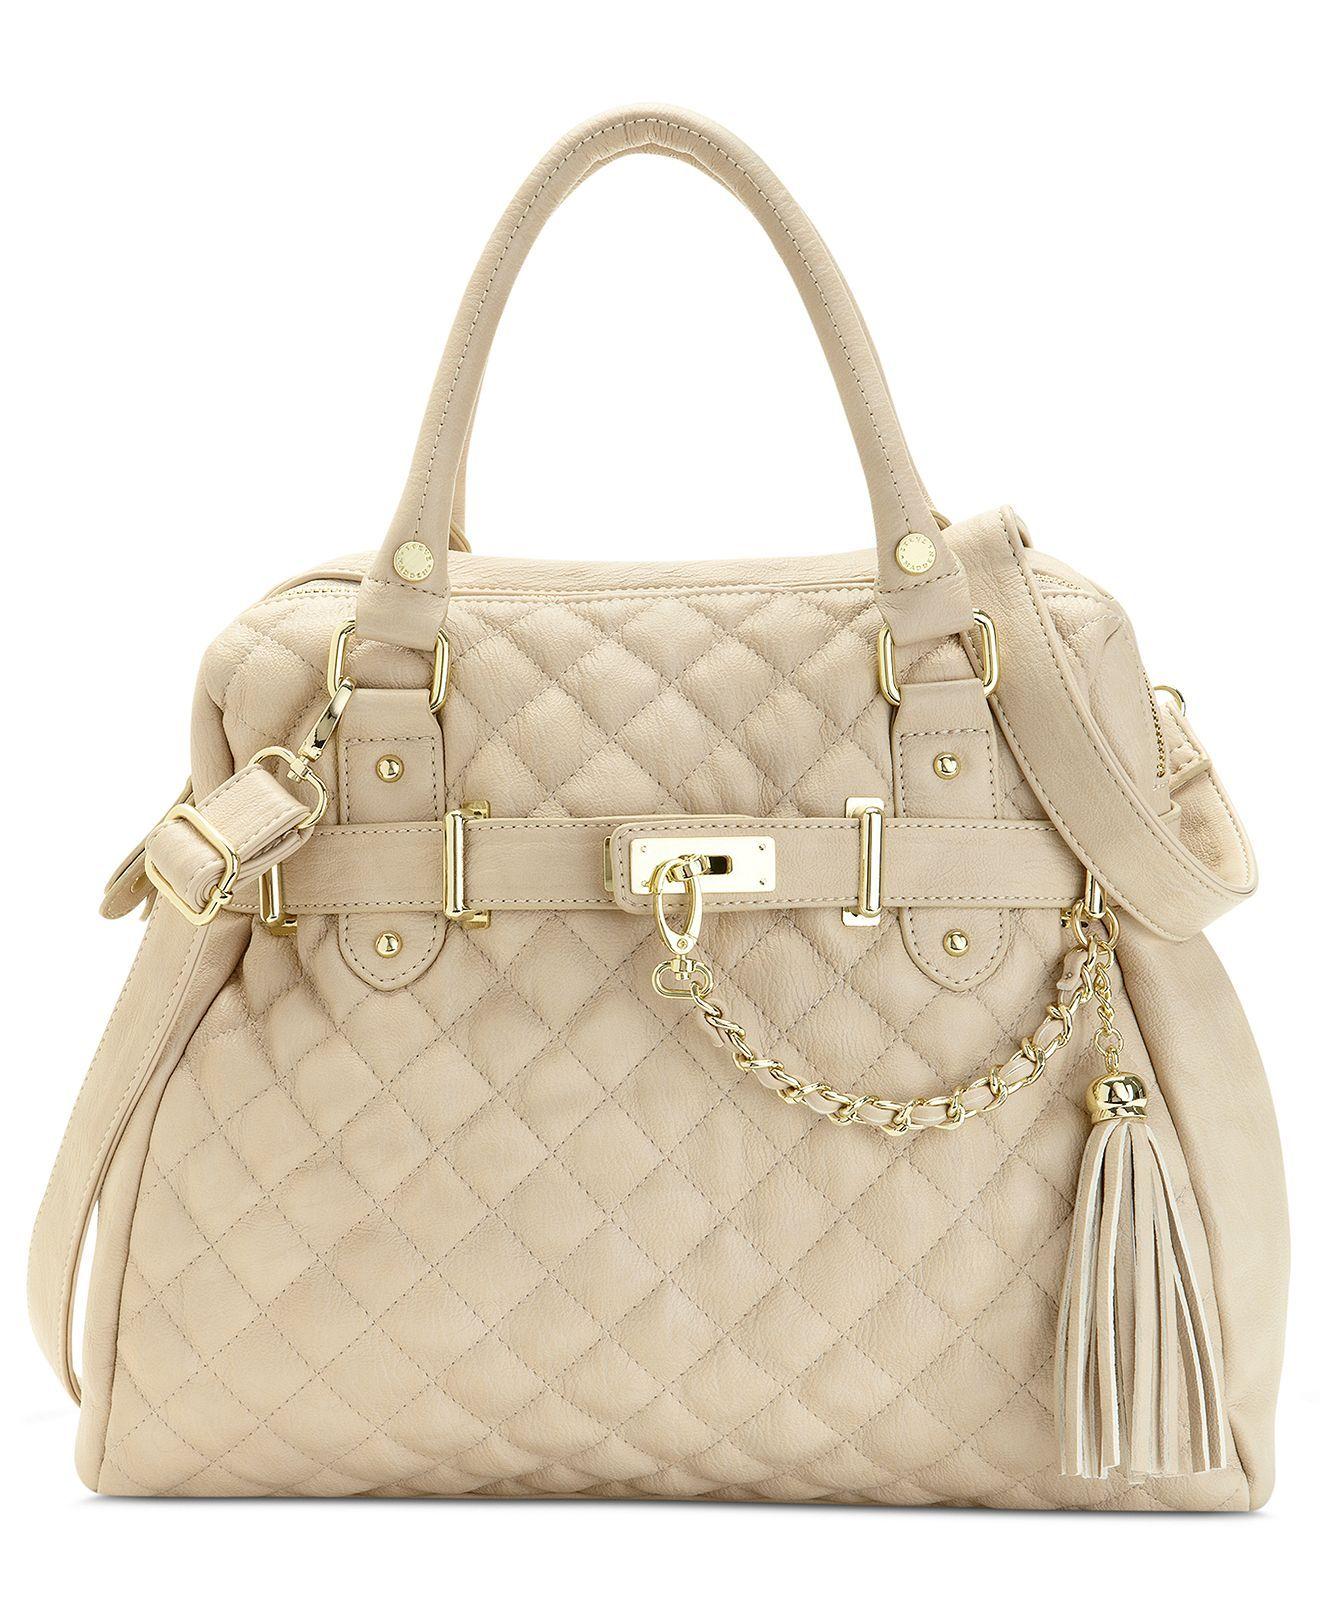 Steve Madden Handbag Bparker Quilted Satchel Handbags Accessories Macy S